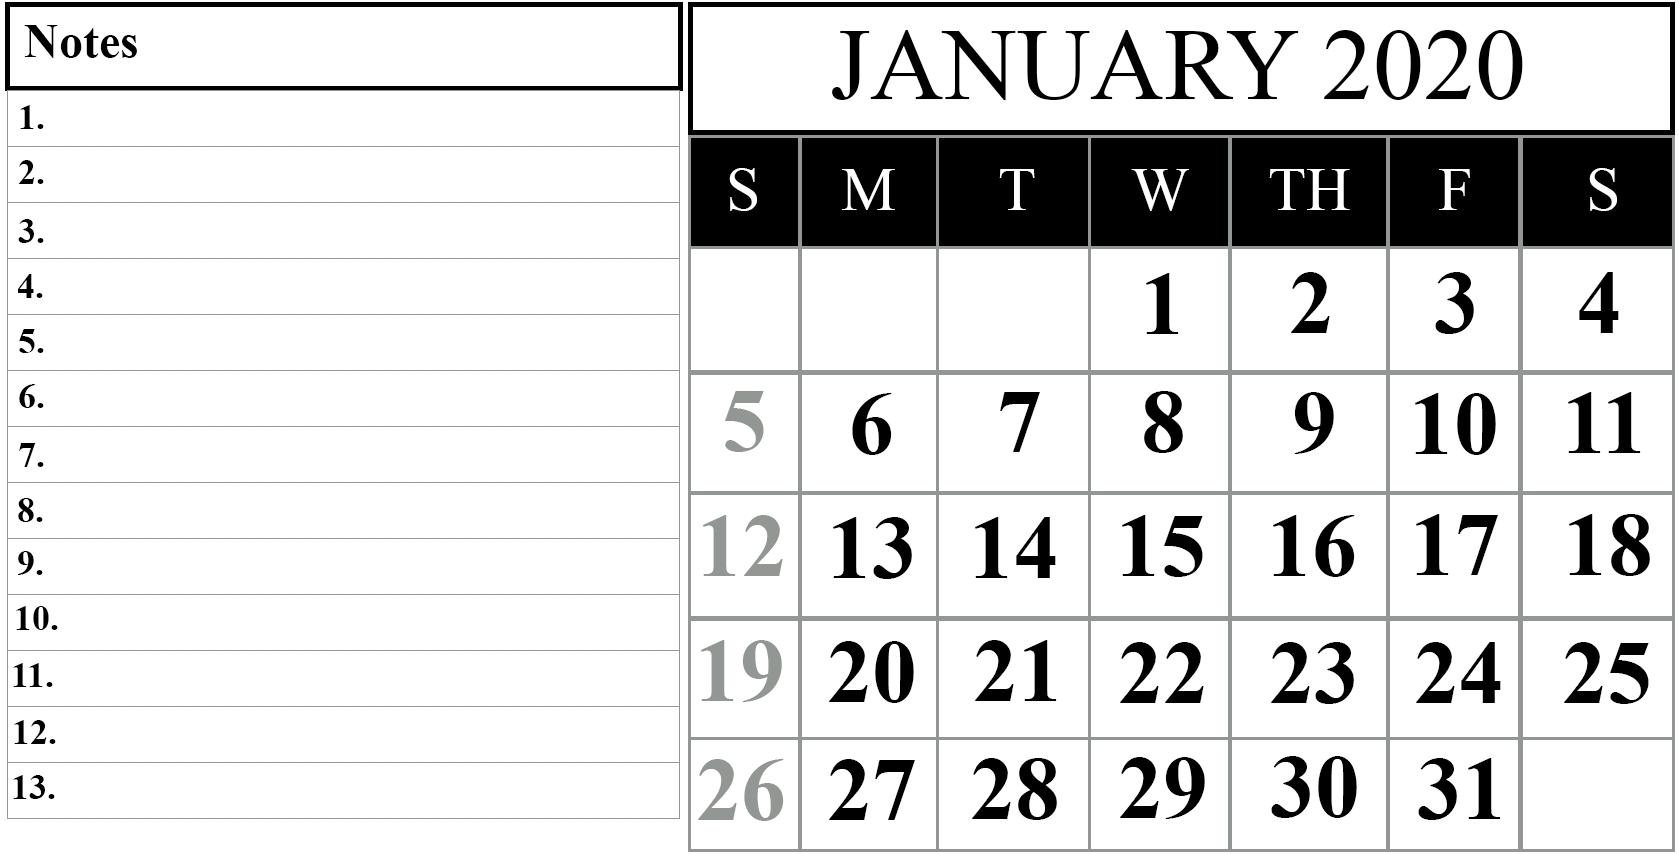 Blank 2020 Calendars To Edit – Calendar Inspiration Design Online Calander I Can Edit